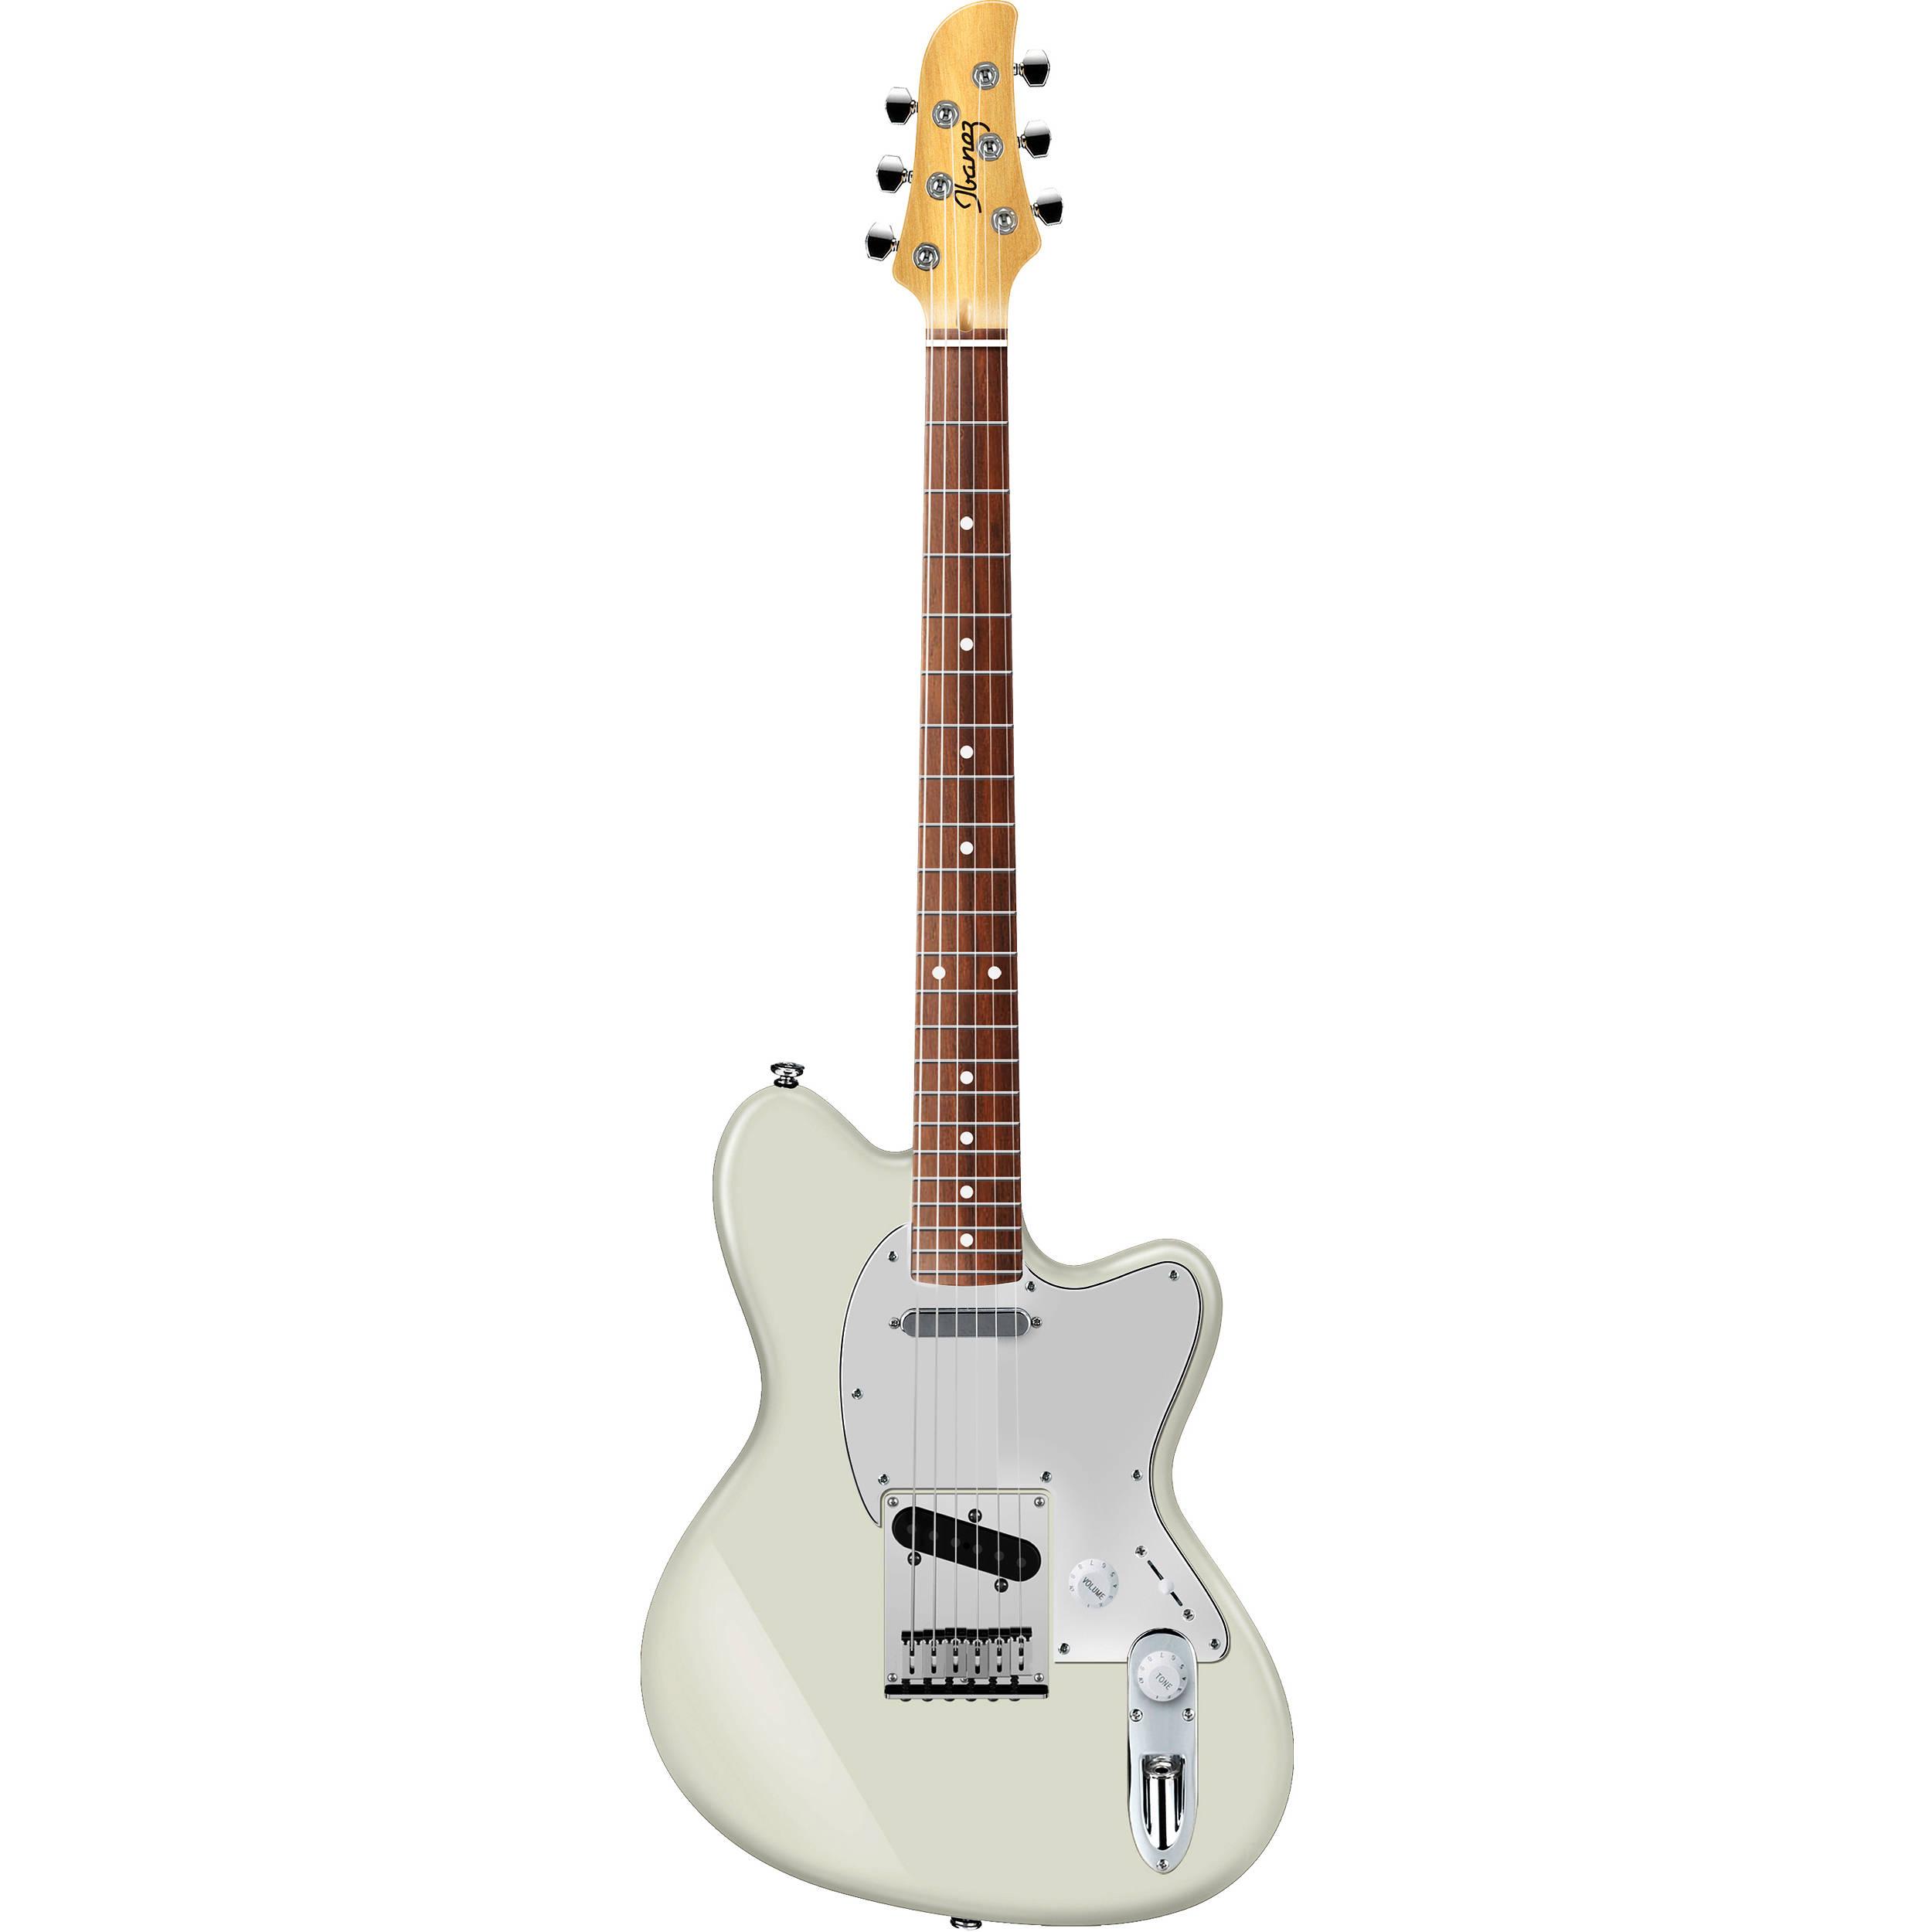 ibanez tm302 talman standard series electric guitar tm302iv b h. Black Bedroom Furniture Sets. Home Design Ideas